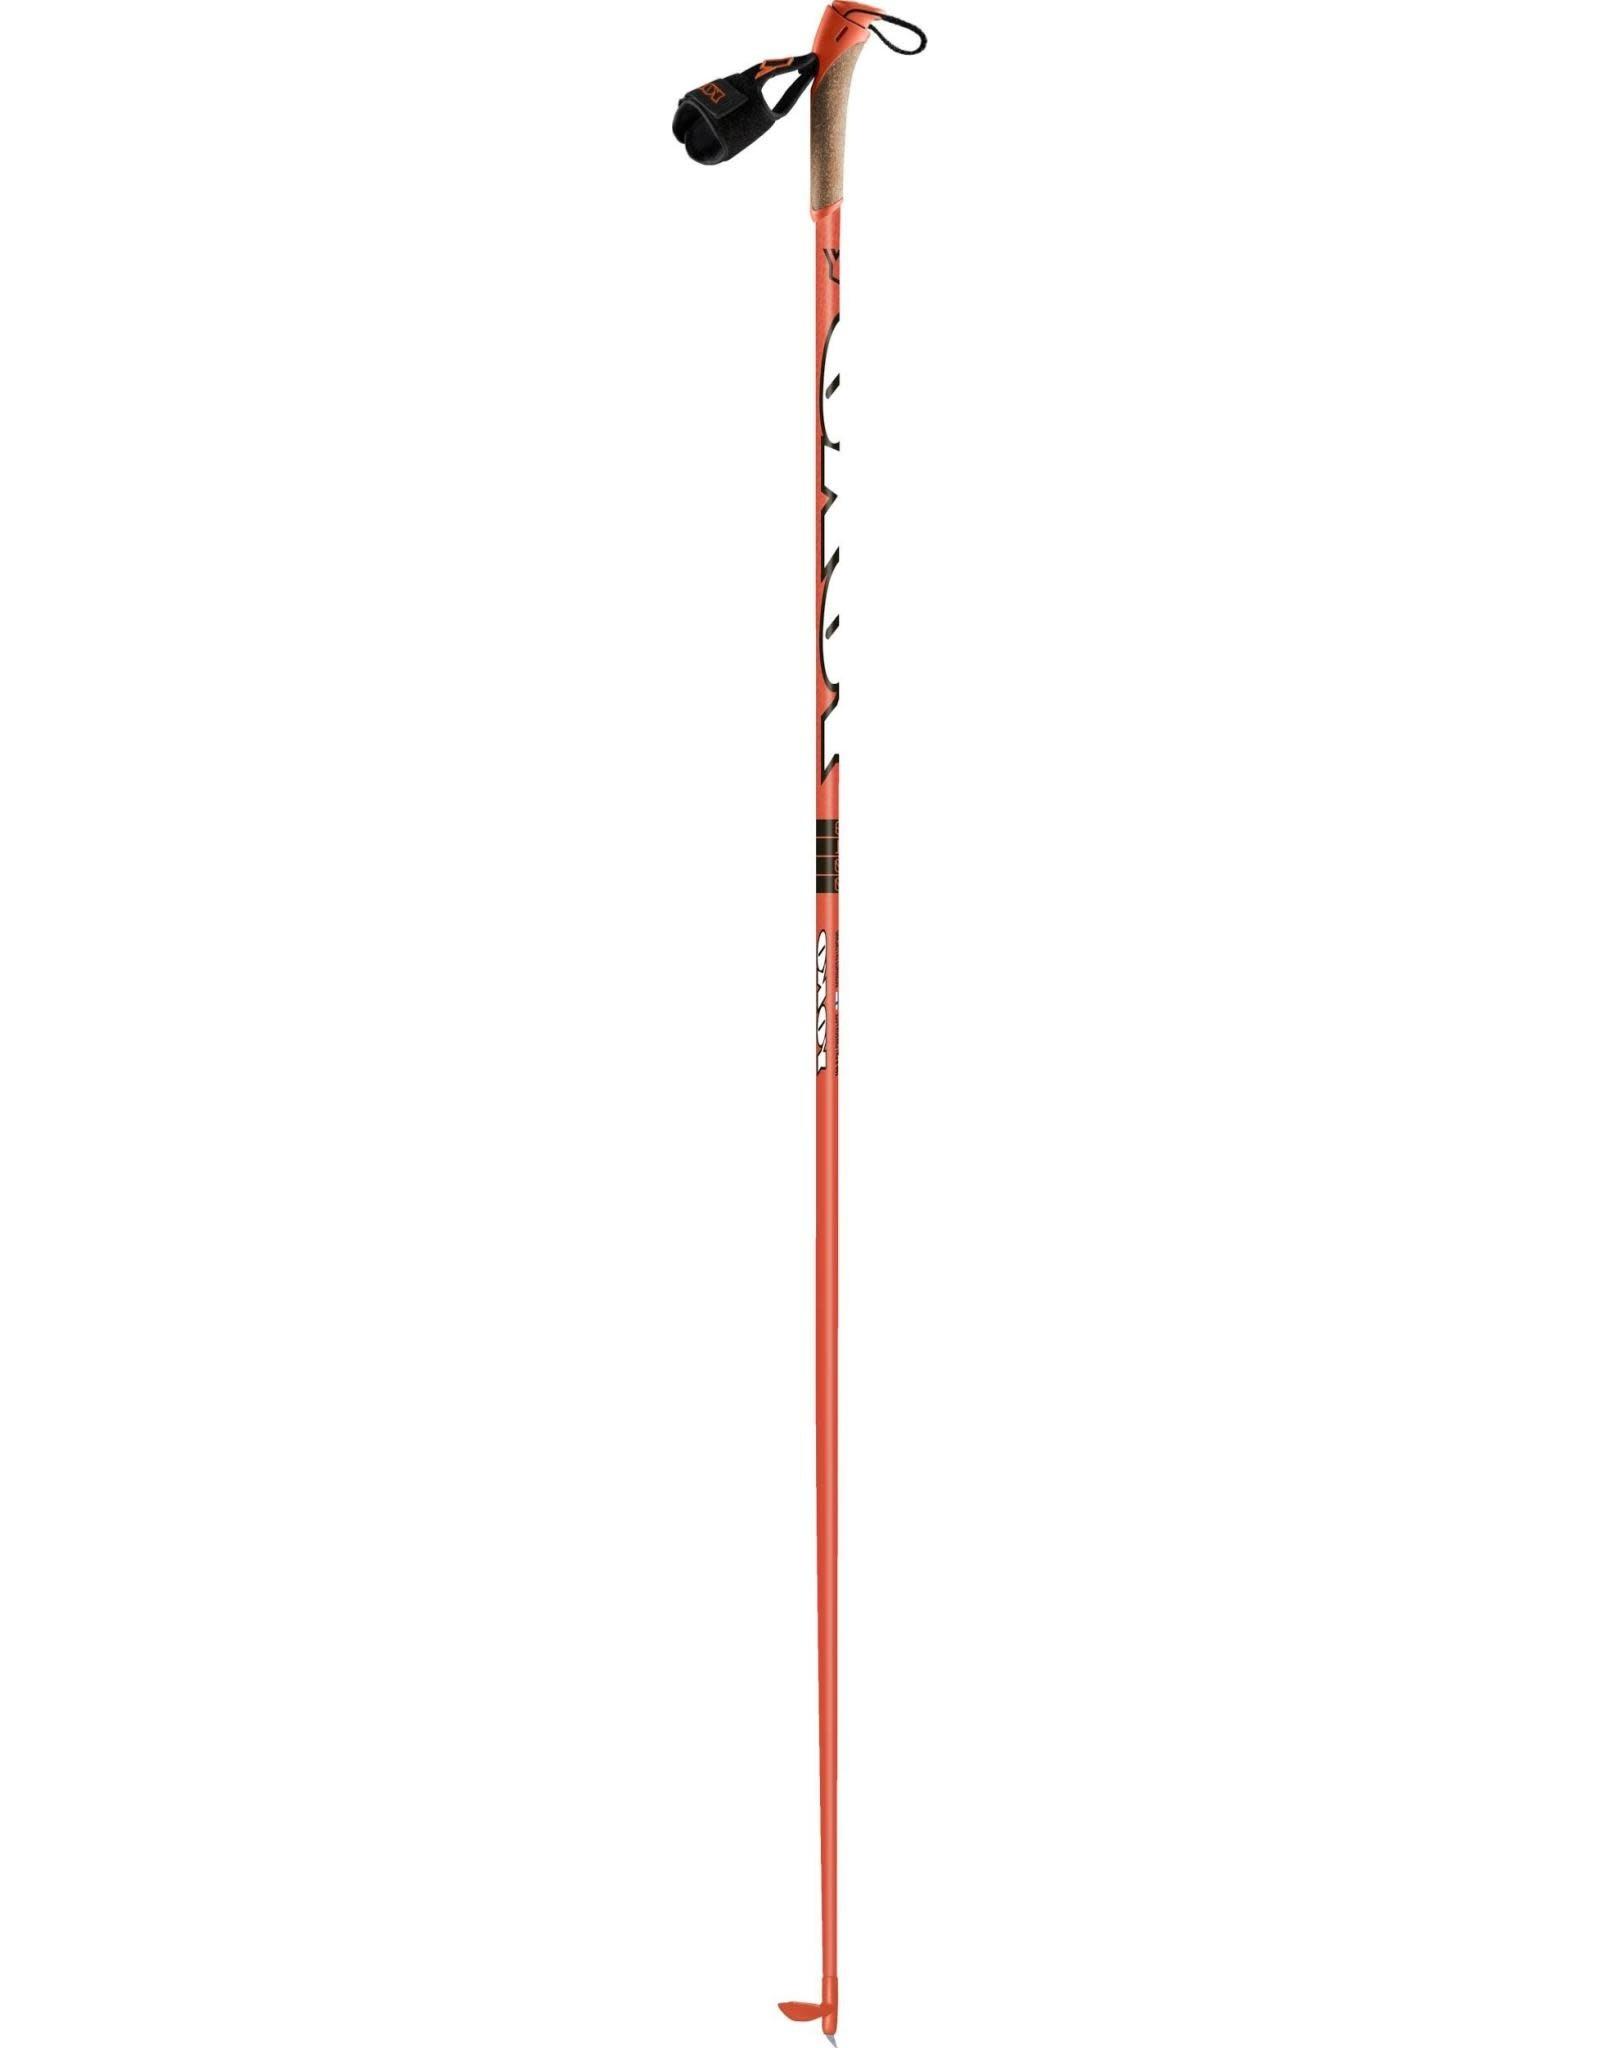 Yoko Yoko 9100 Series Pole